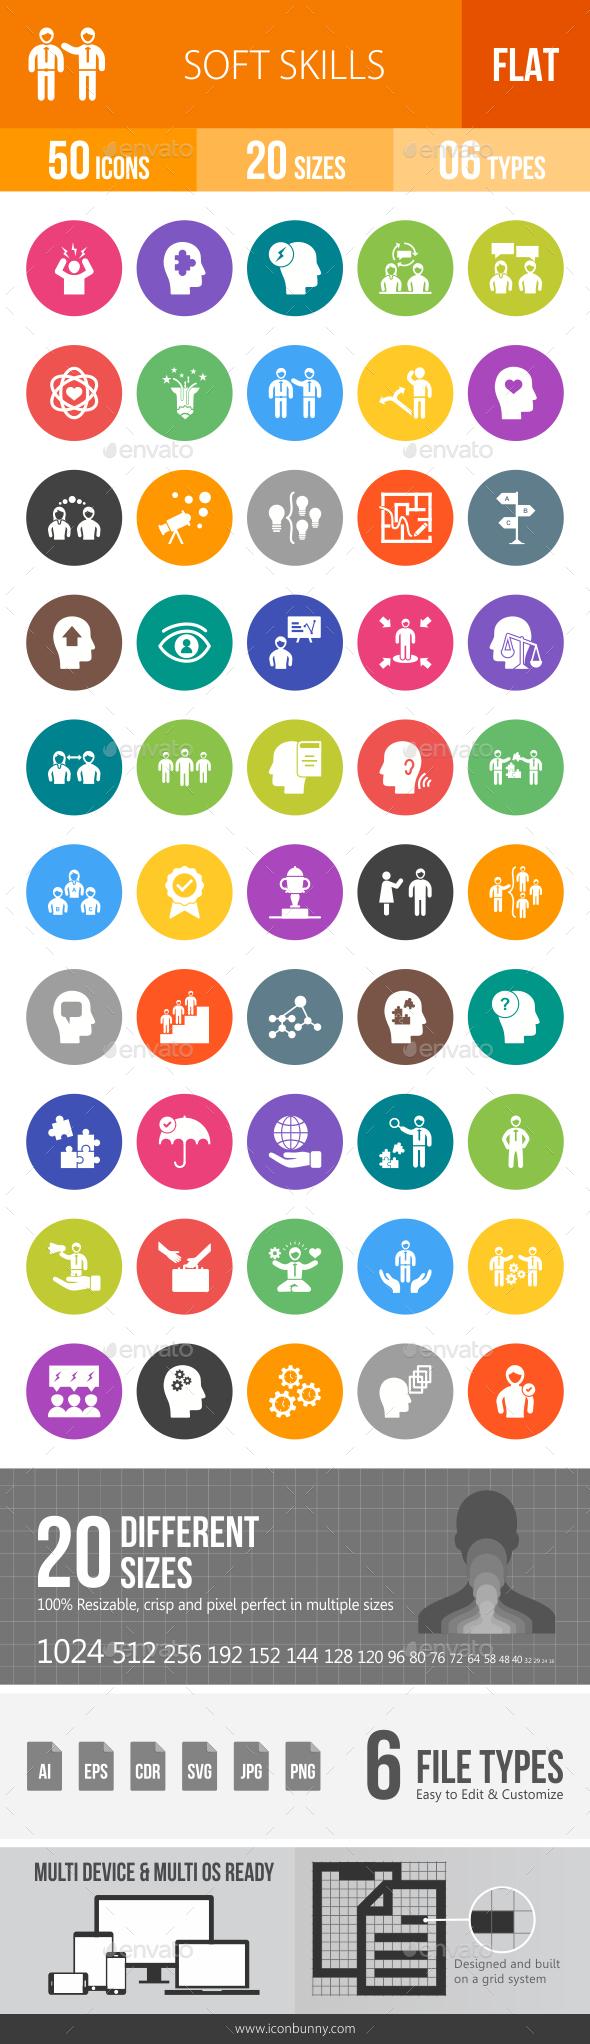 Soft Skills Flat Round Icons - Icons